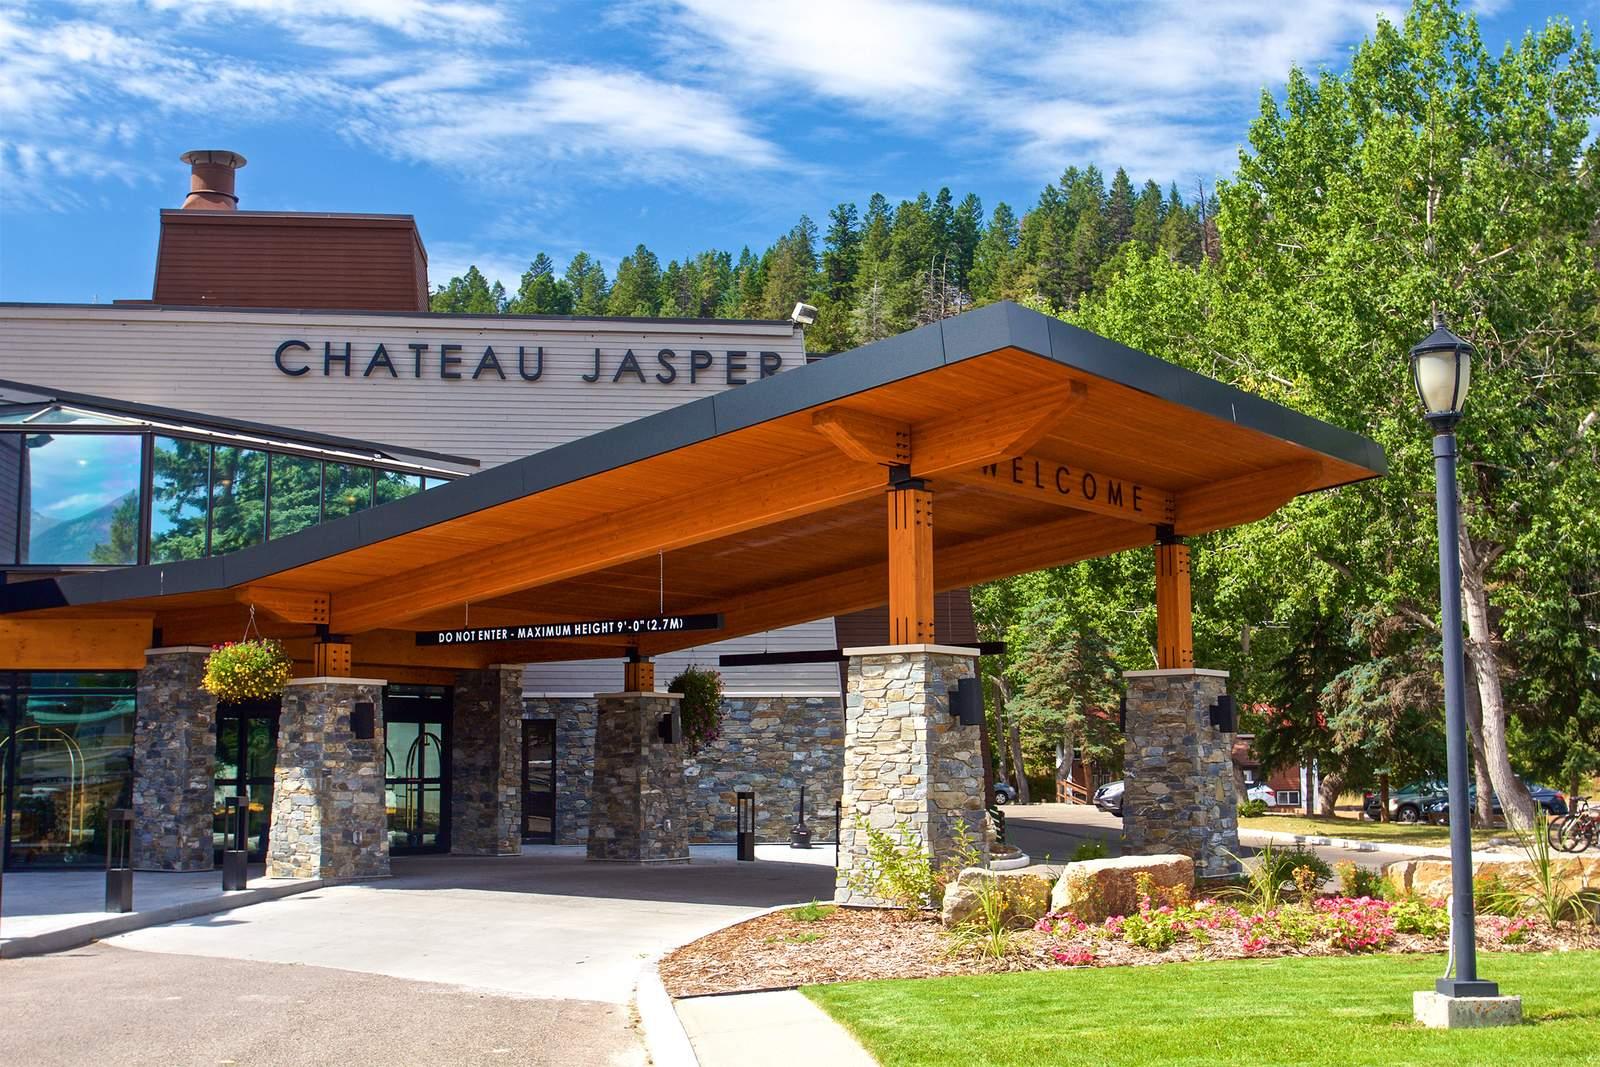 Chateau Jasper